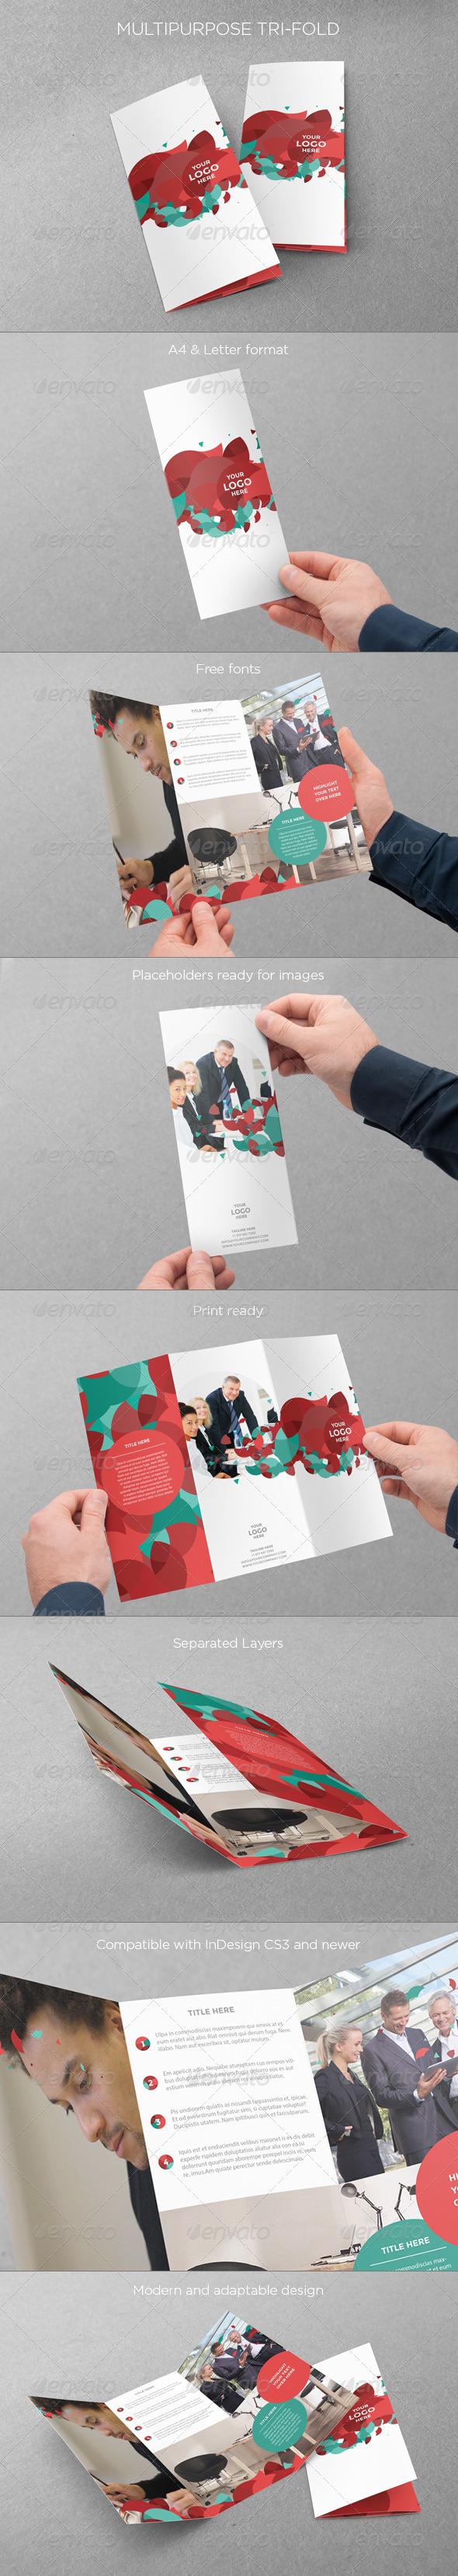 Multipurpose Tri-fold - Informational Brochures